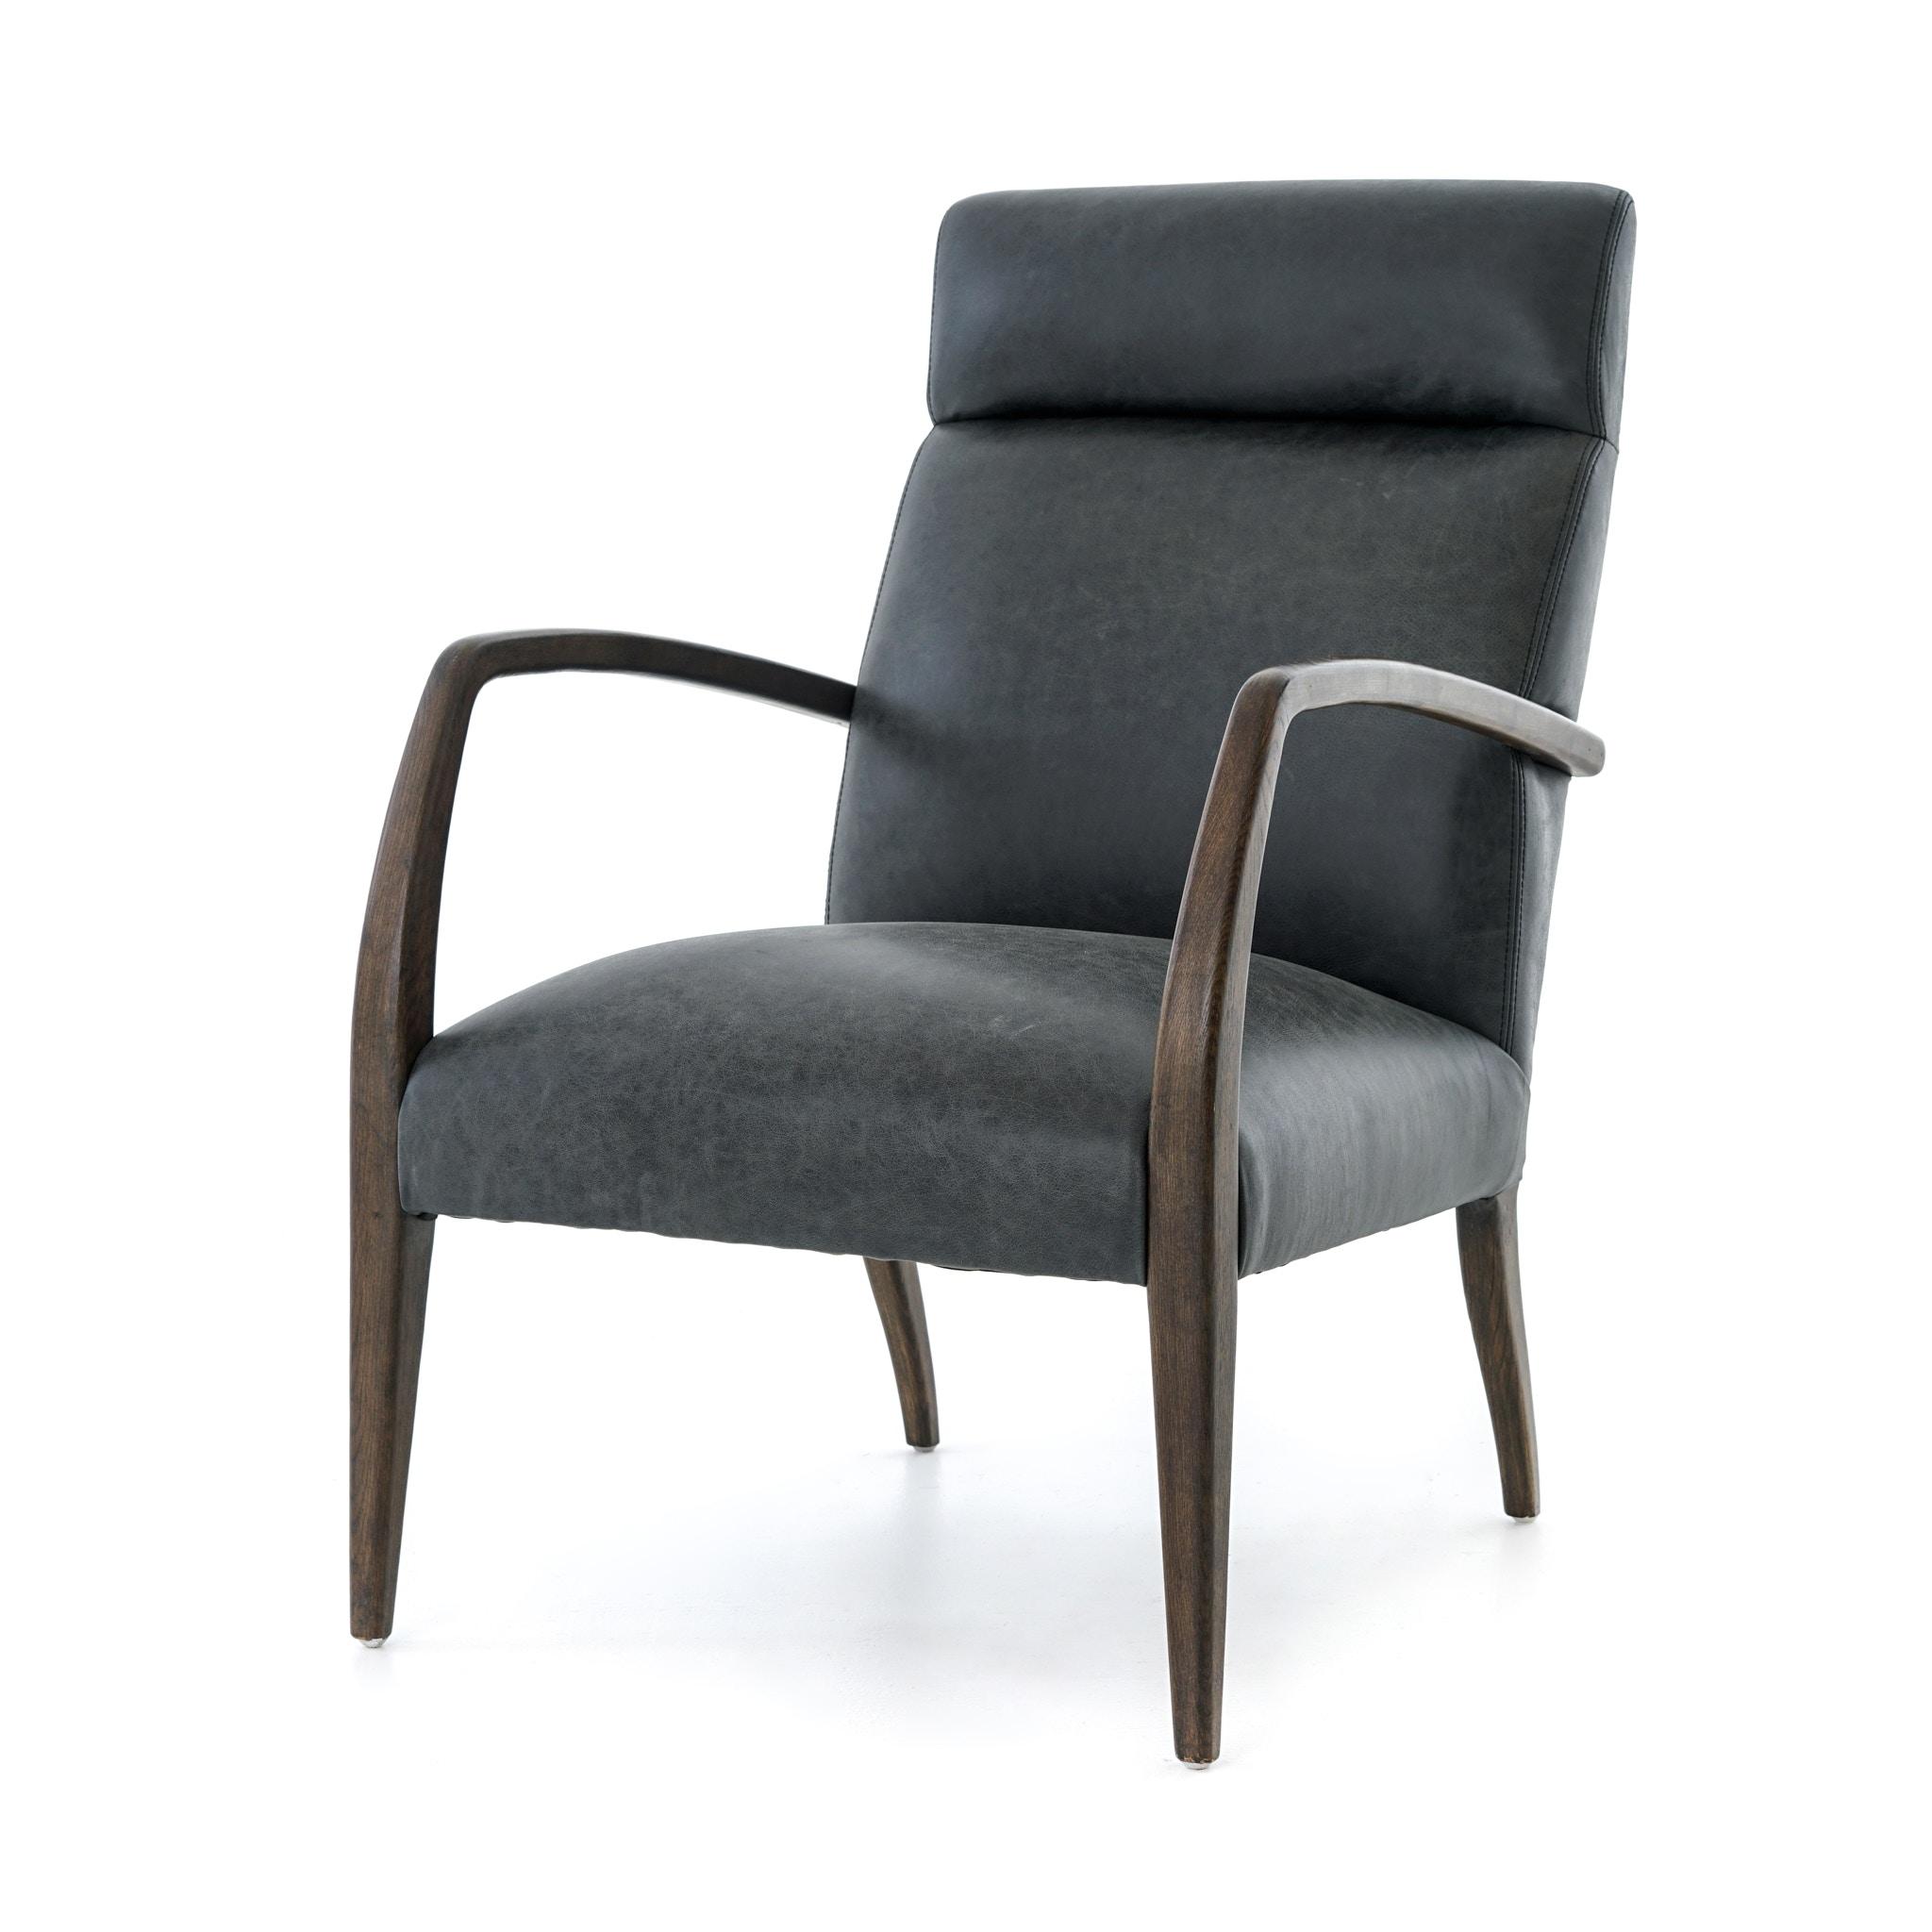 Four Hands Furniture Bryson Chair Chaps Ebony CABT 47